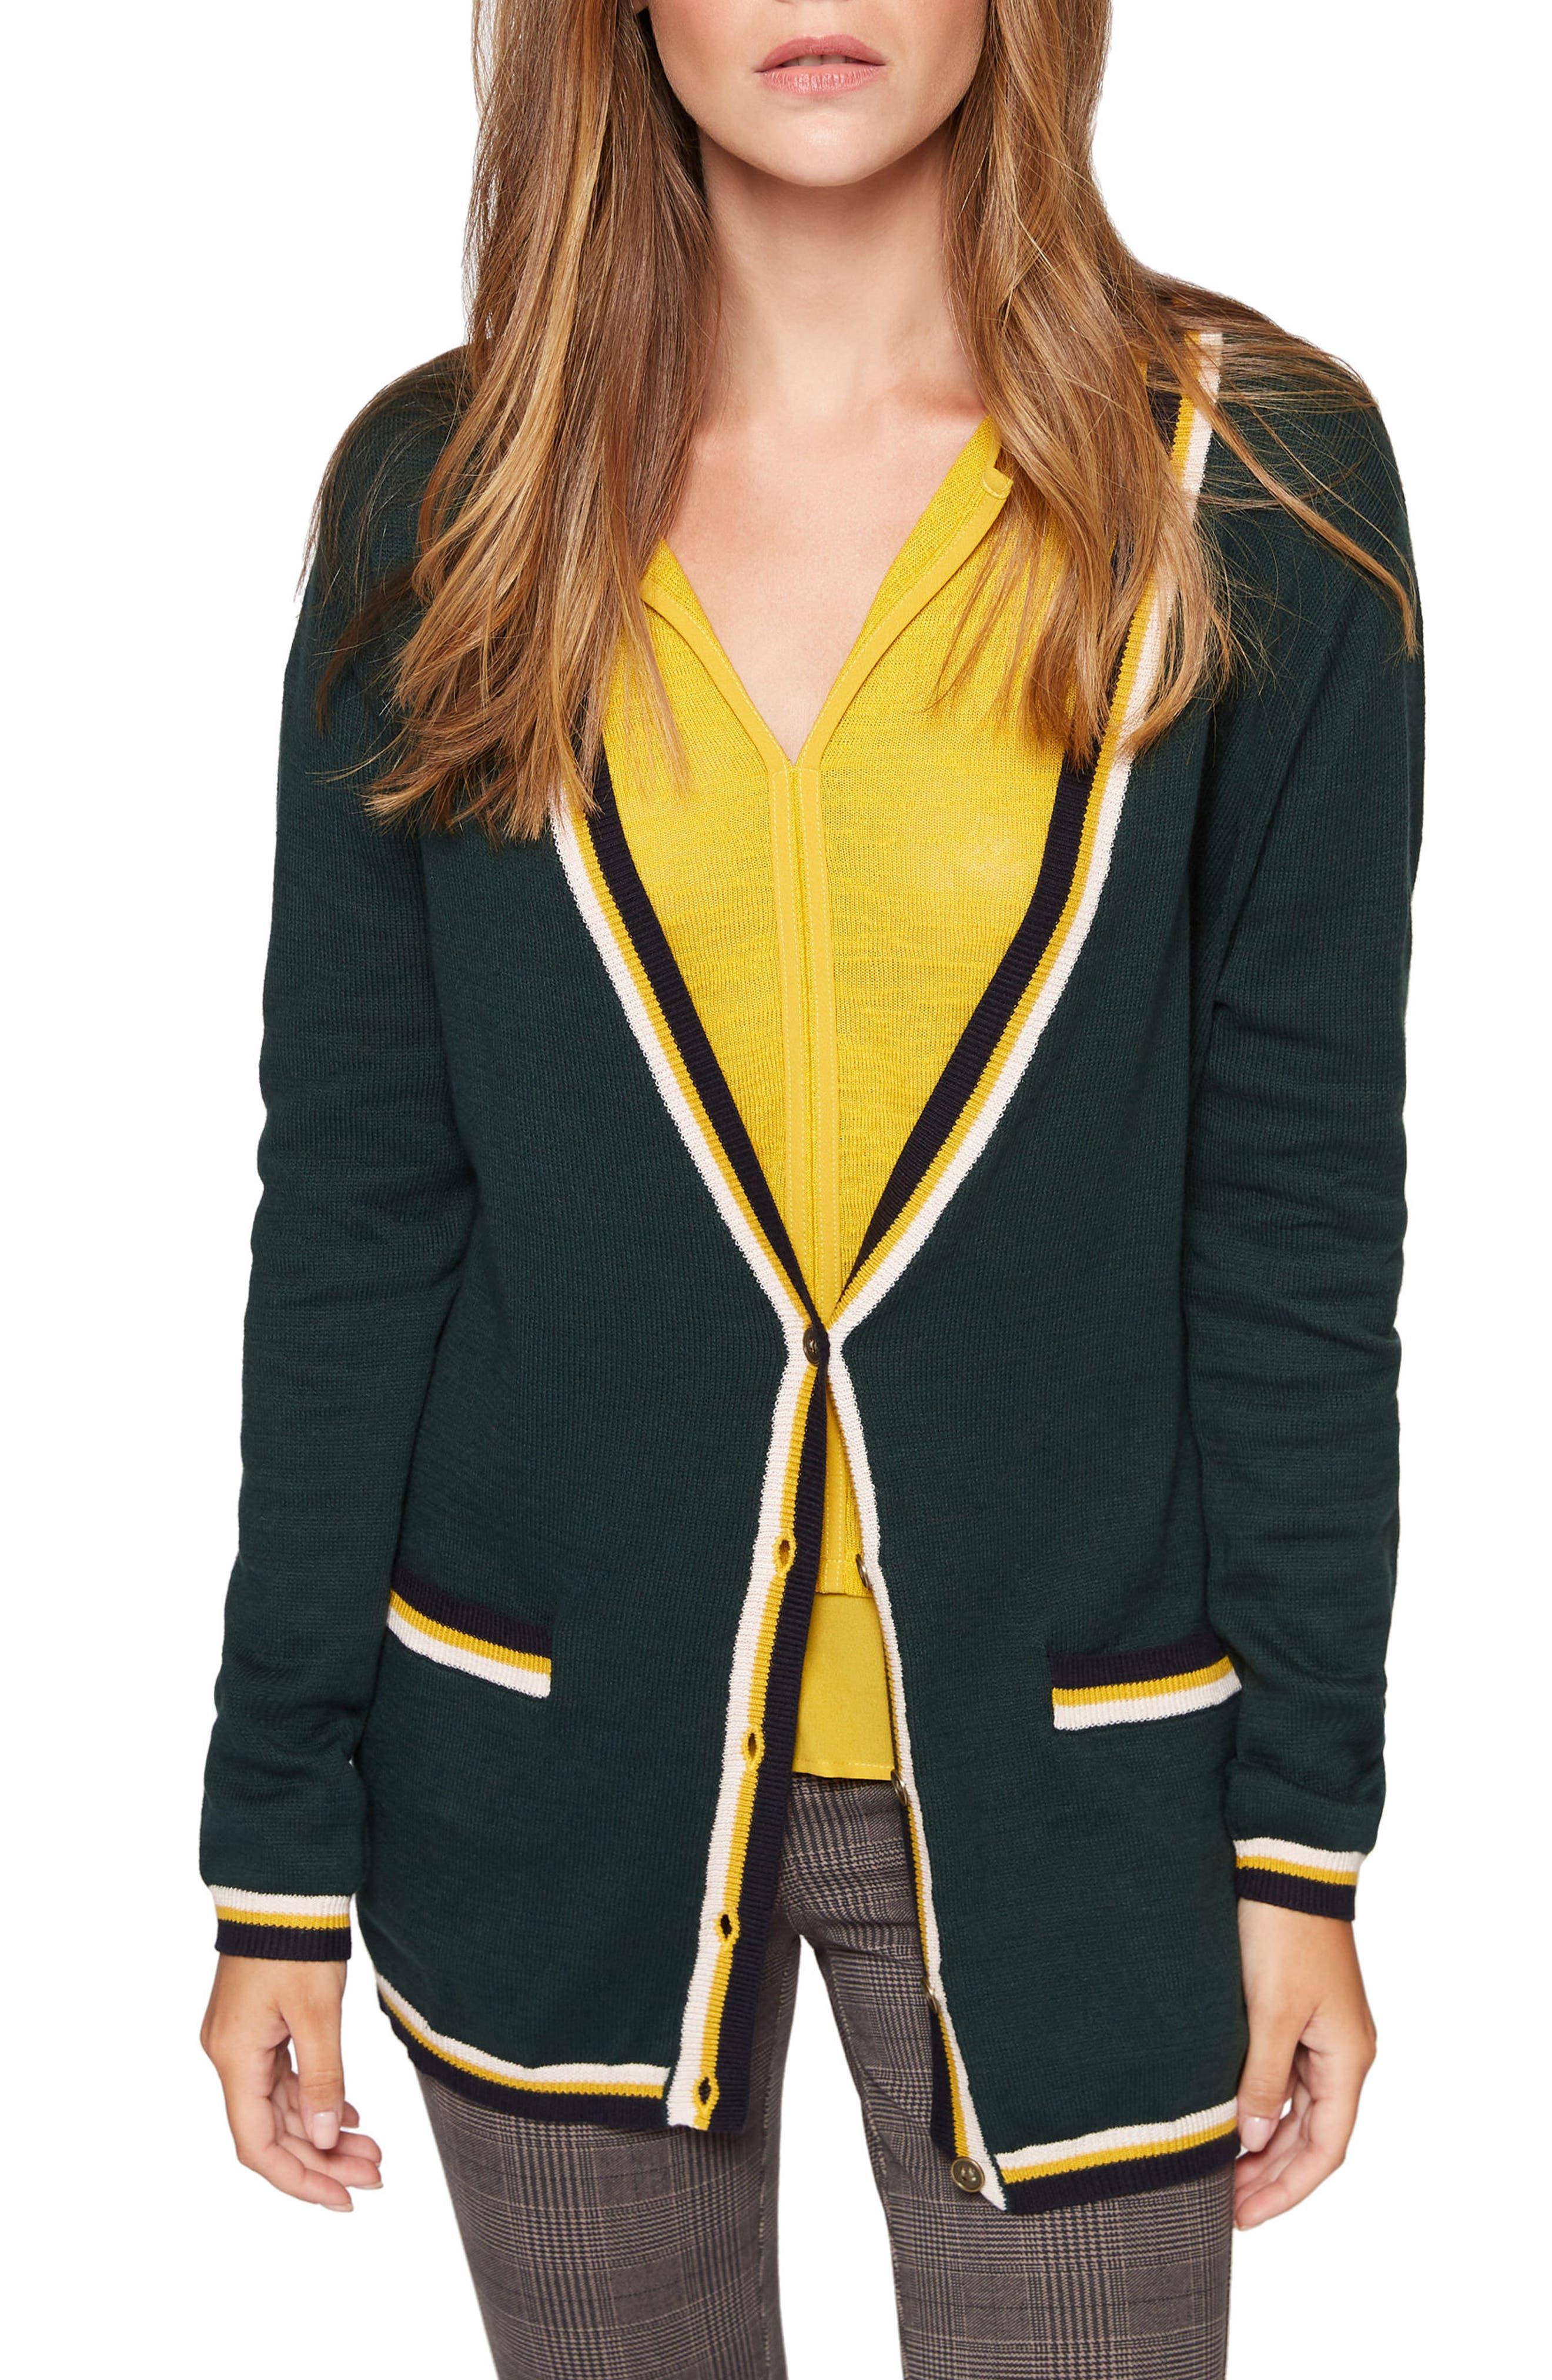 Cotton Blend Club Cardigan,                             Main thumbnail 1, color,                             Meadow Green Multi